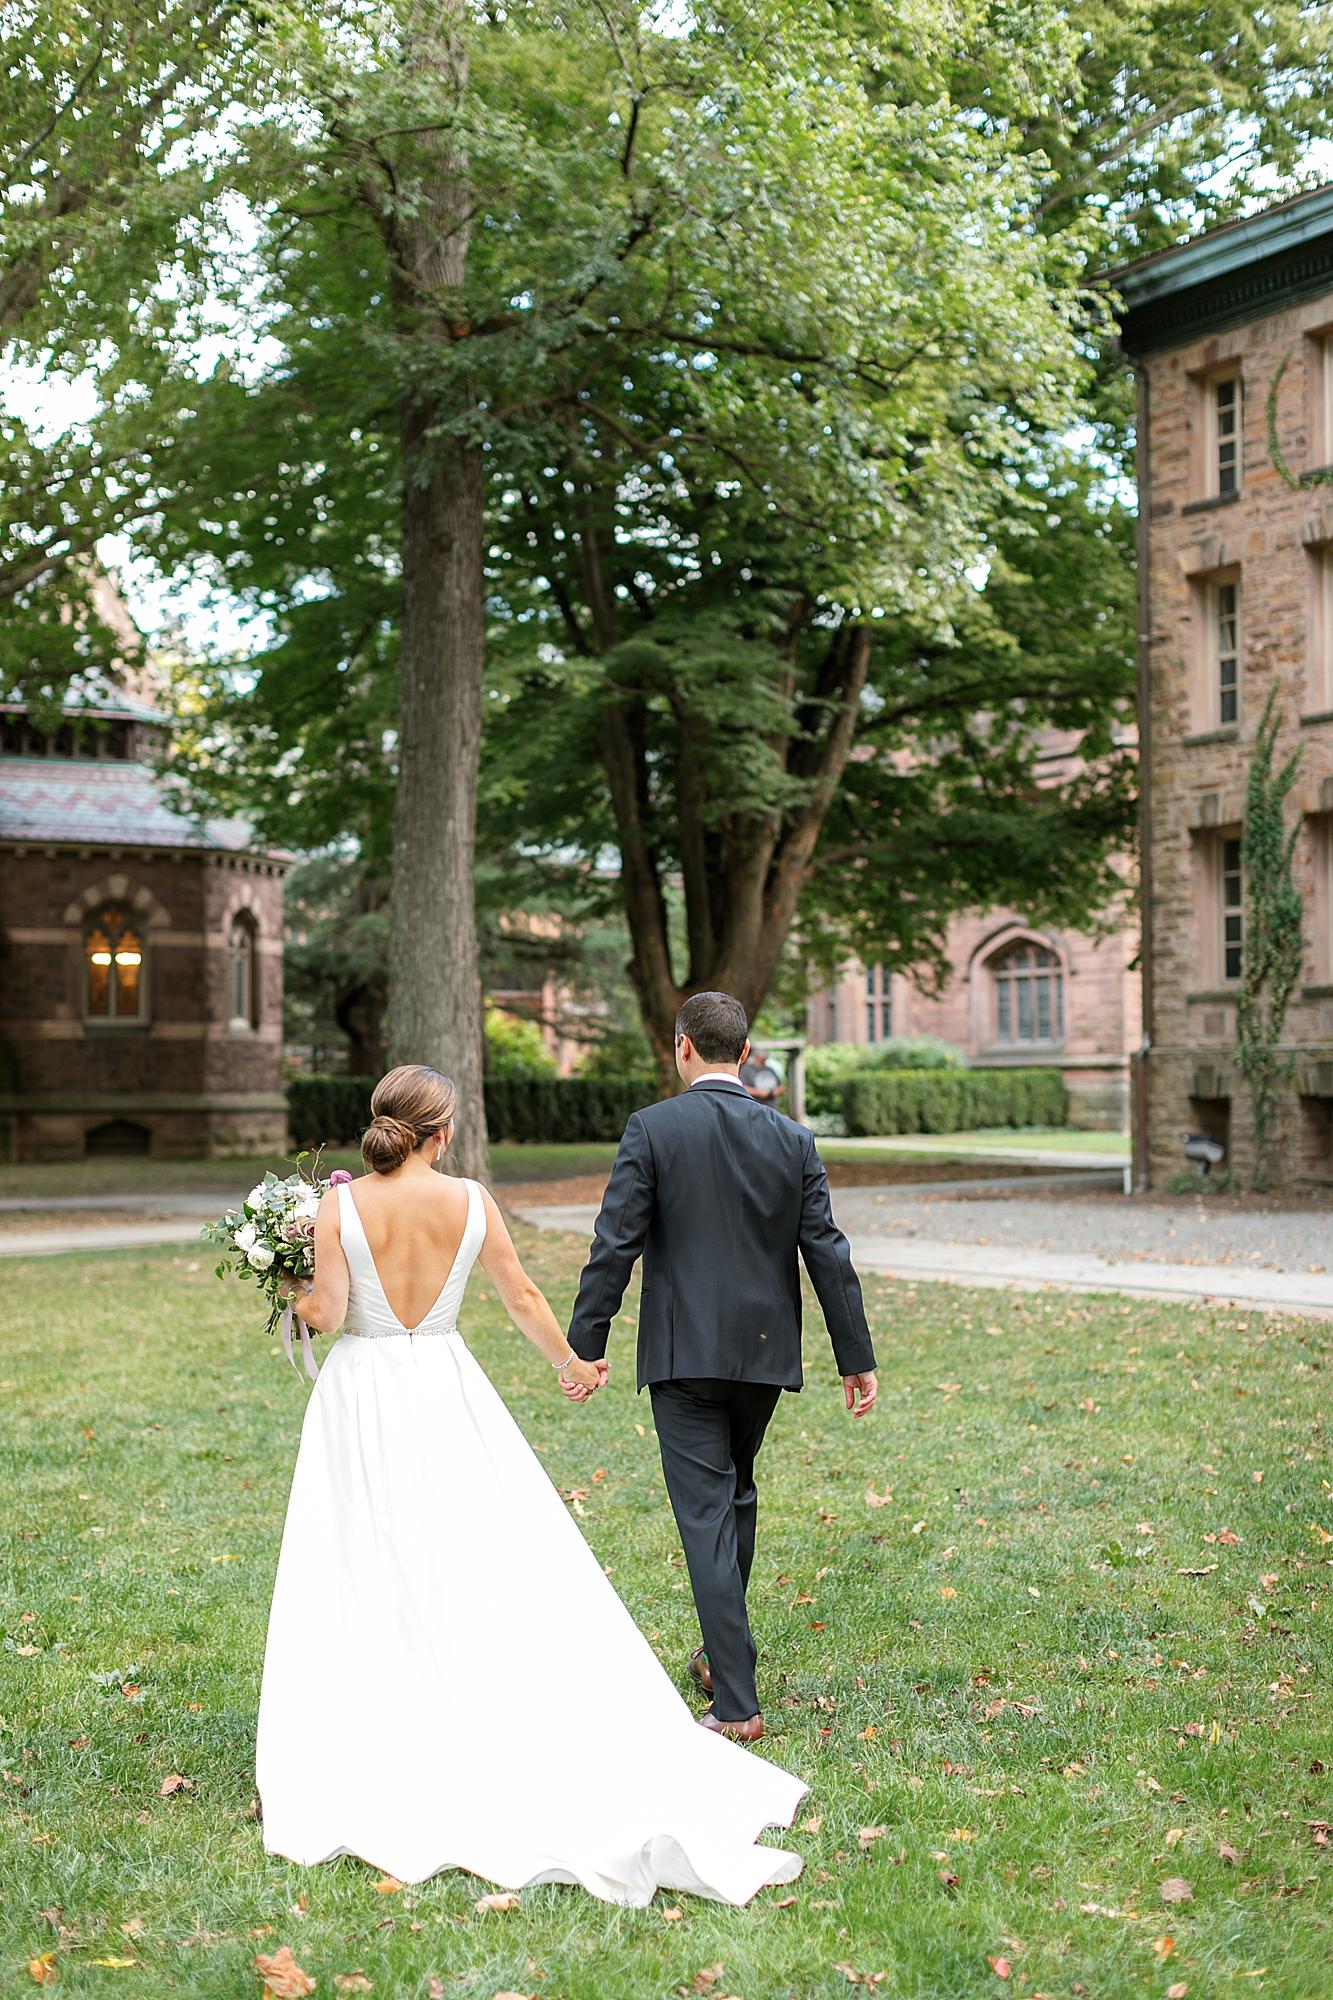 Princeton New Jersey Film Wedding Photographer Princeton University Wedding Photography by Magdalena Studios NJ Wedding Photographer21